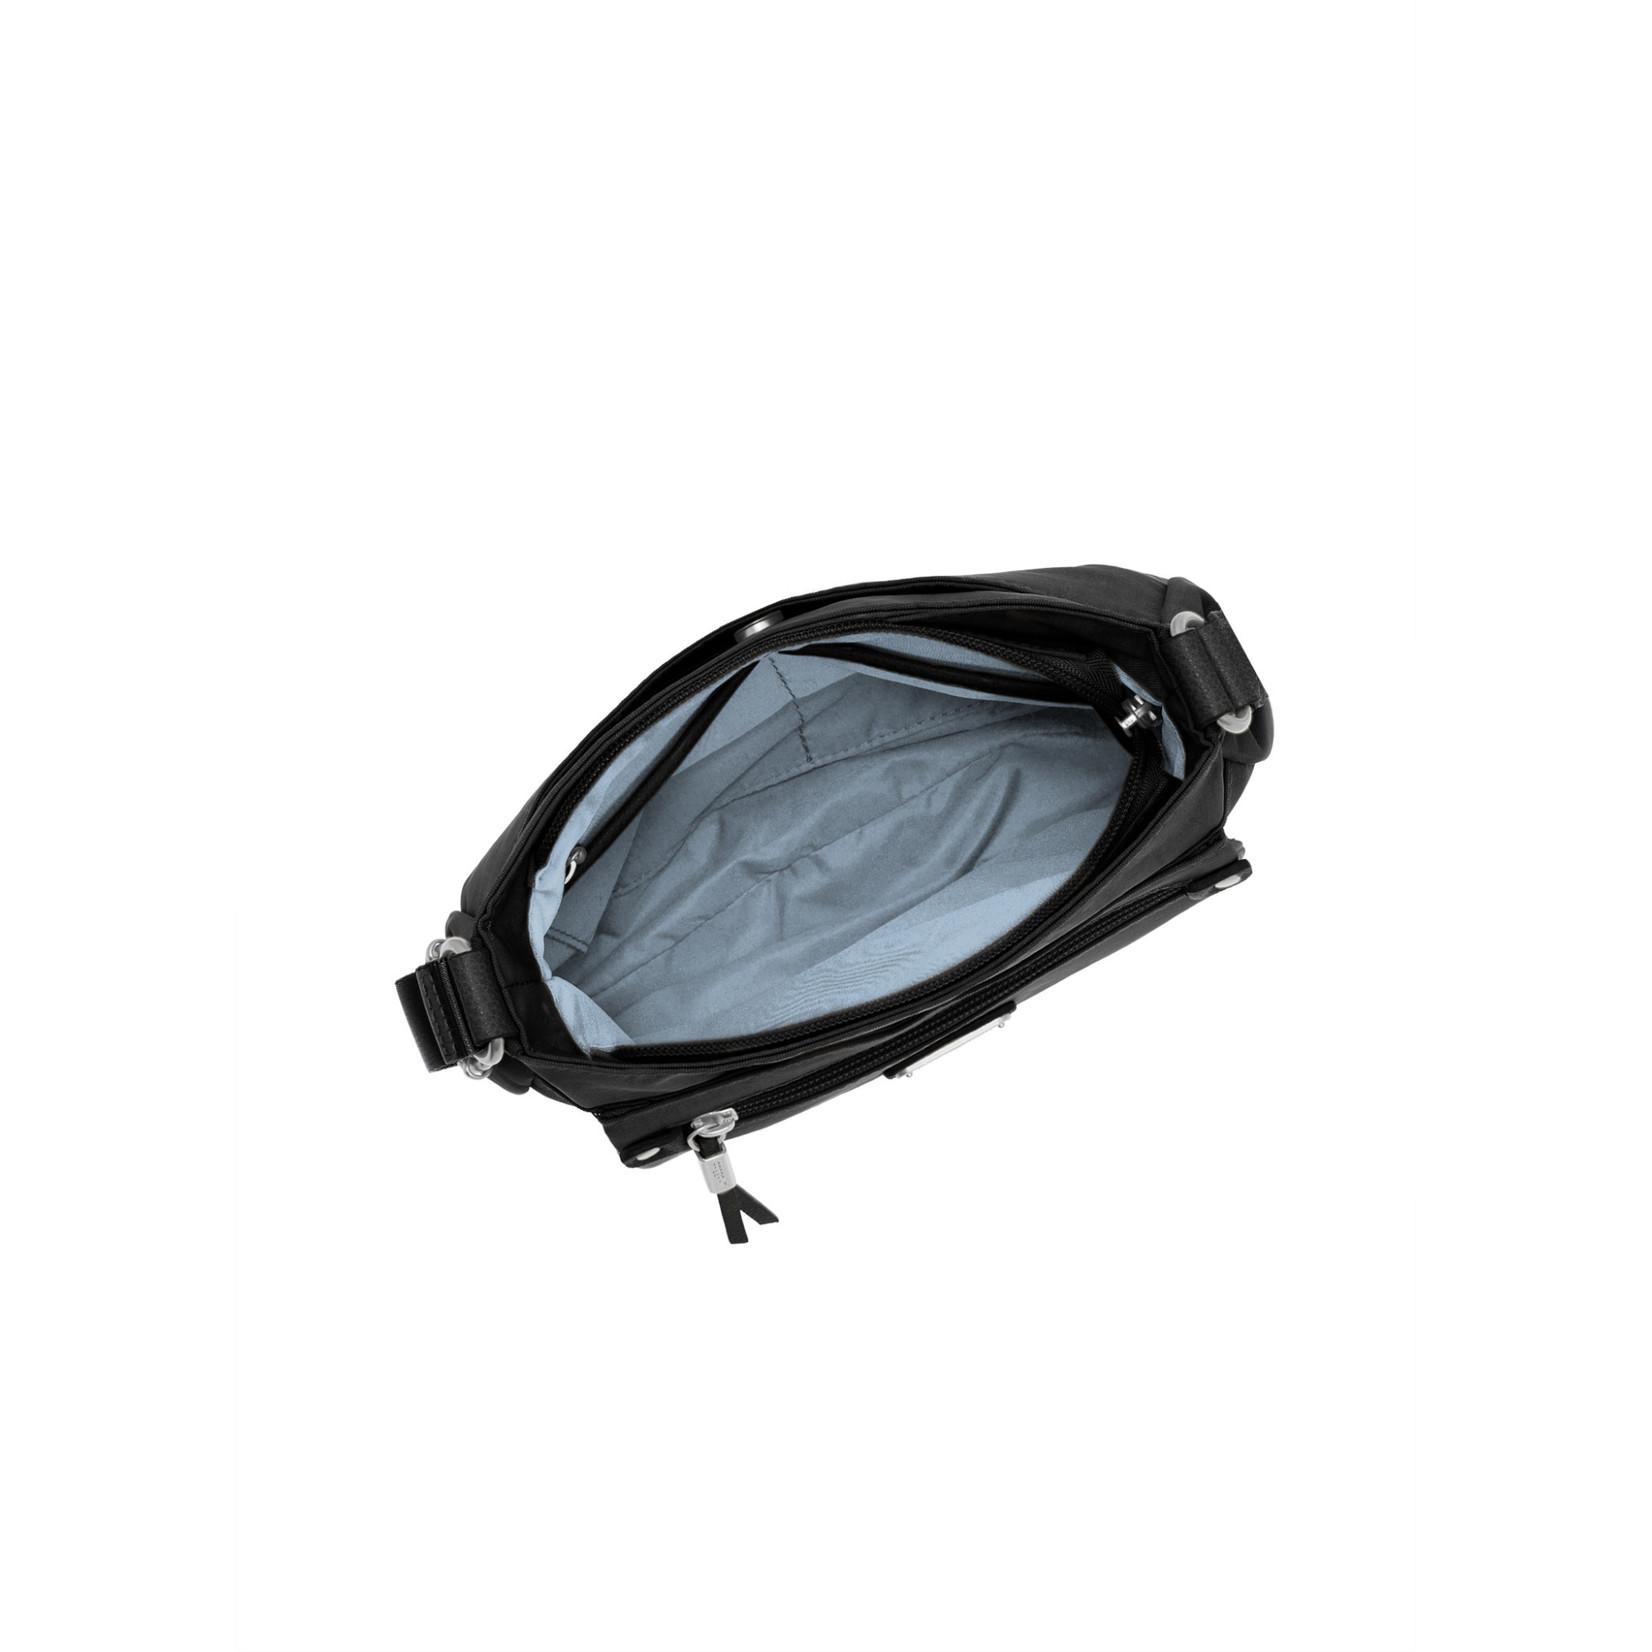 Baggallini Uptown Bagg with RFID Wristlet - Black